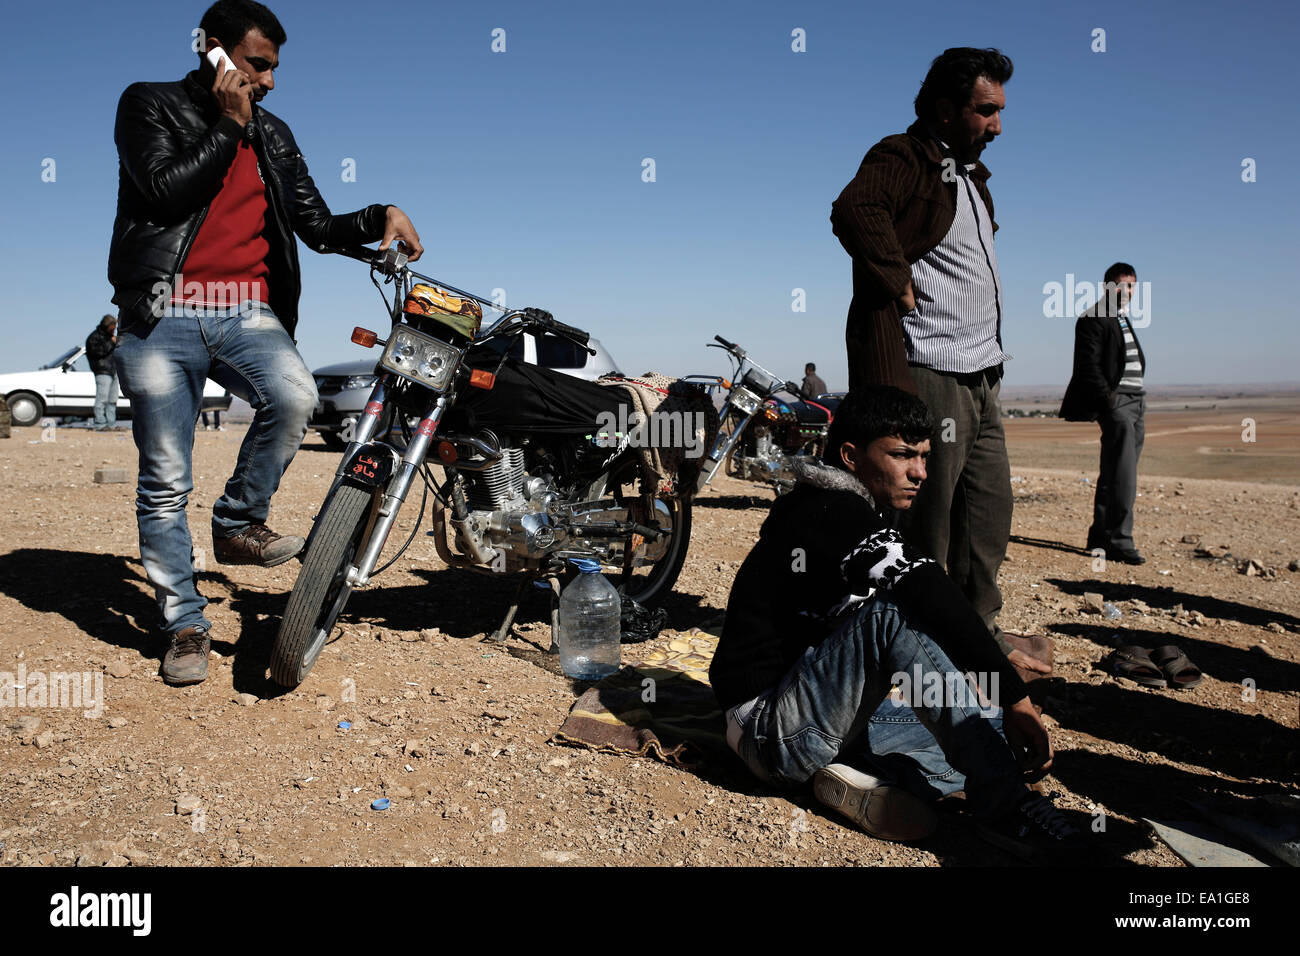 Turkey-Syria border. 5th Nov, 2014. Kurds men watch fighting on the outskirts of Kobani, seen from the Mursitpinar - Stock Image